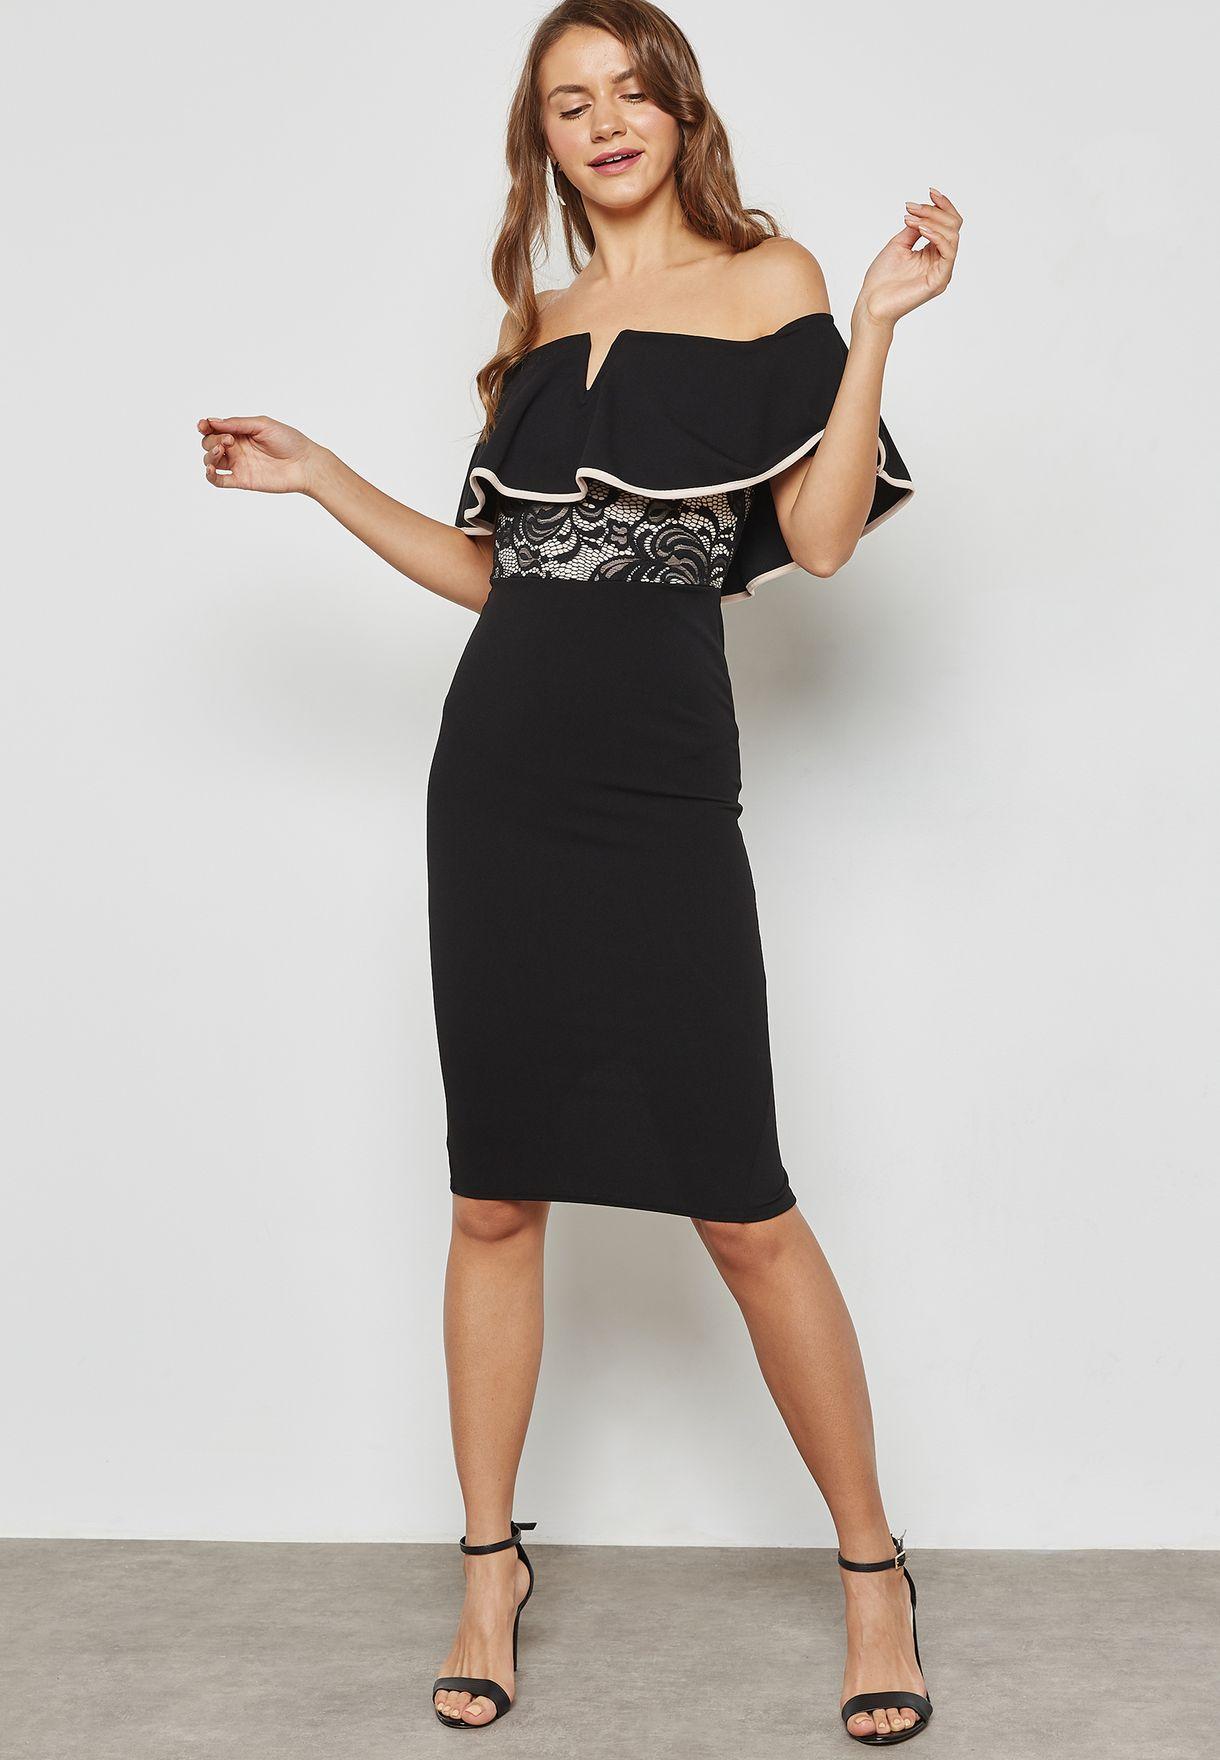 5c8280b06ac9d2 Shop Ginger black Lace Insert Ruffle Bardot Dress M847 for Women in ...